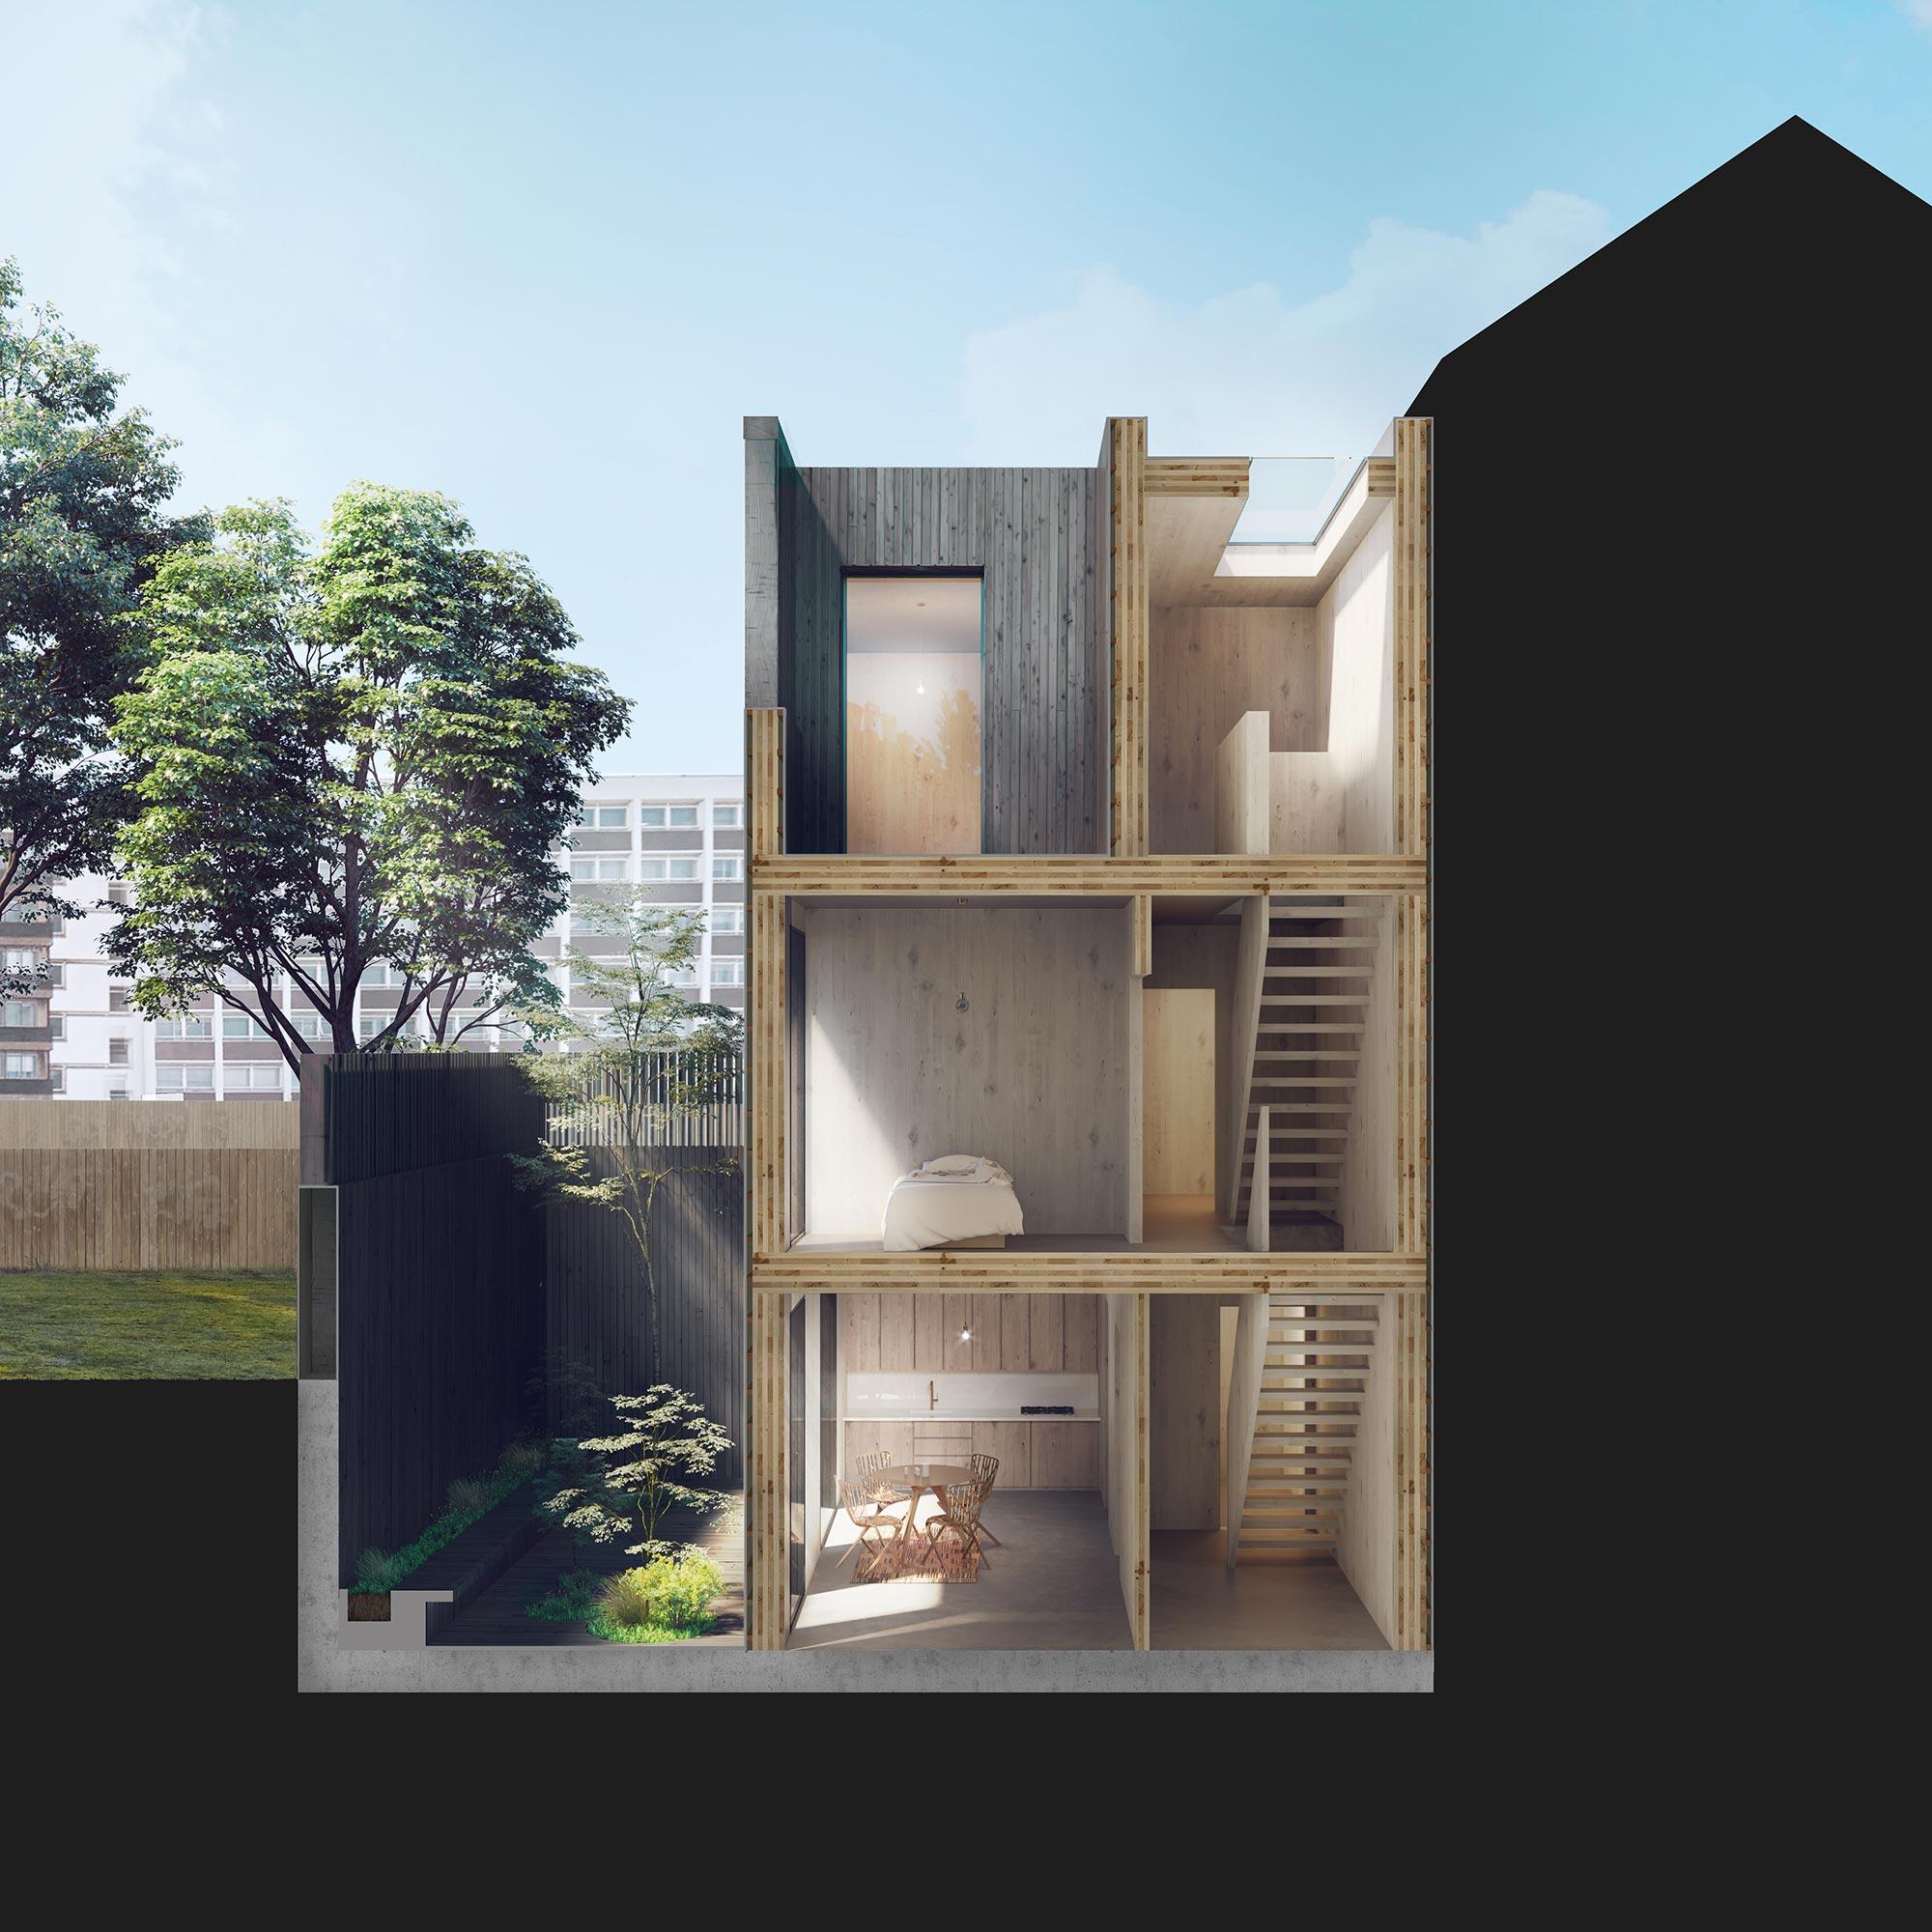 cube-haus-adjaye-associates-architects-cs-2000px-02